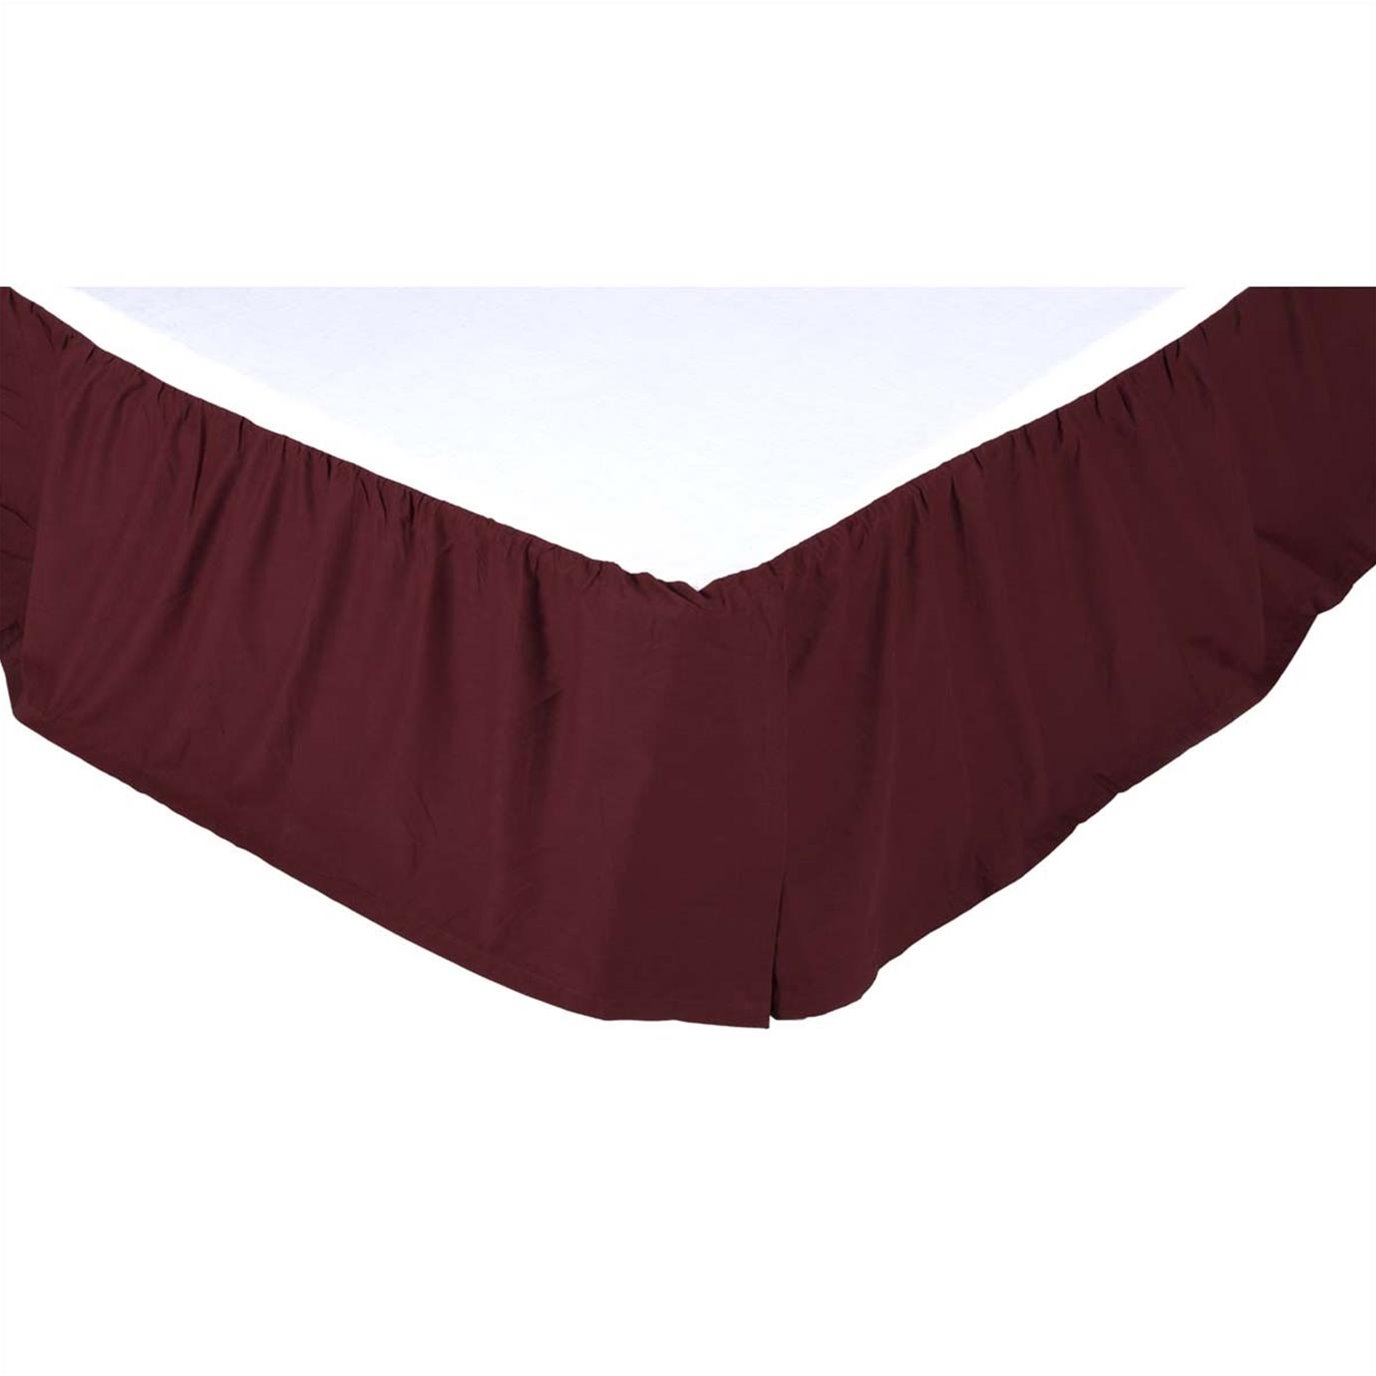 Solid Burgundy Queen Bed Skirt 60x80x16